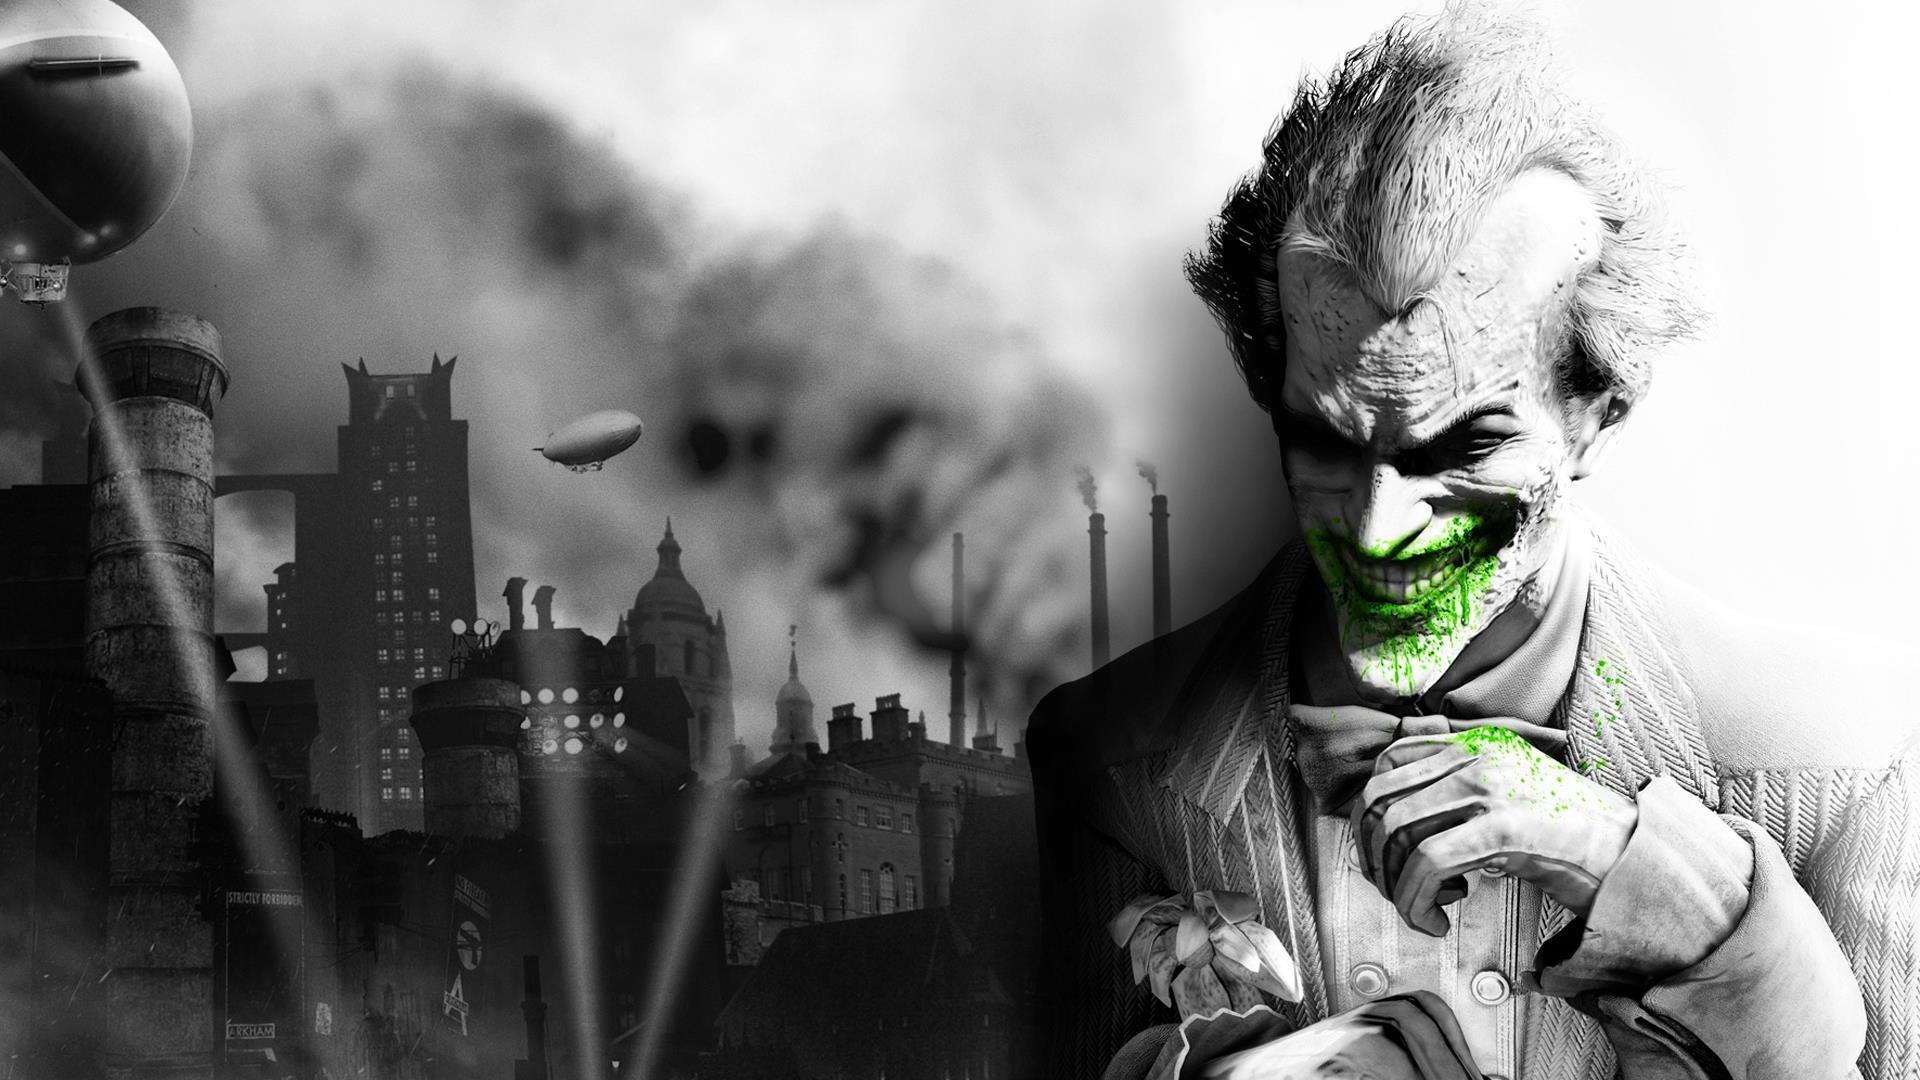 free download batman: arkham city wallpaper id:300094 hd 1080p for